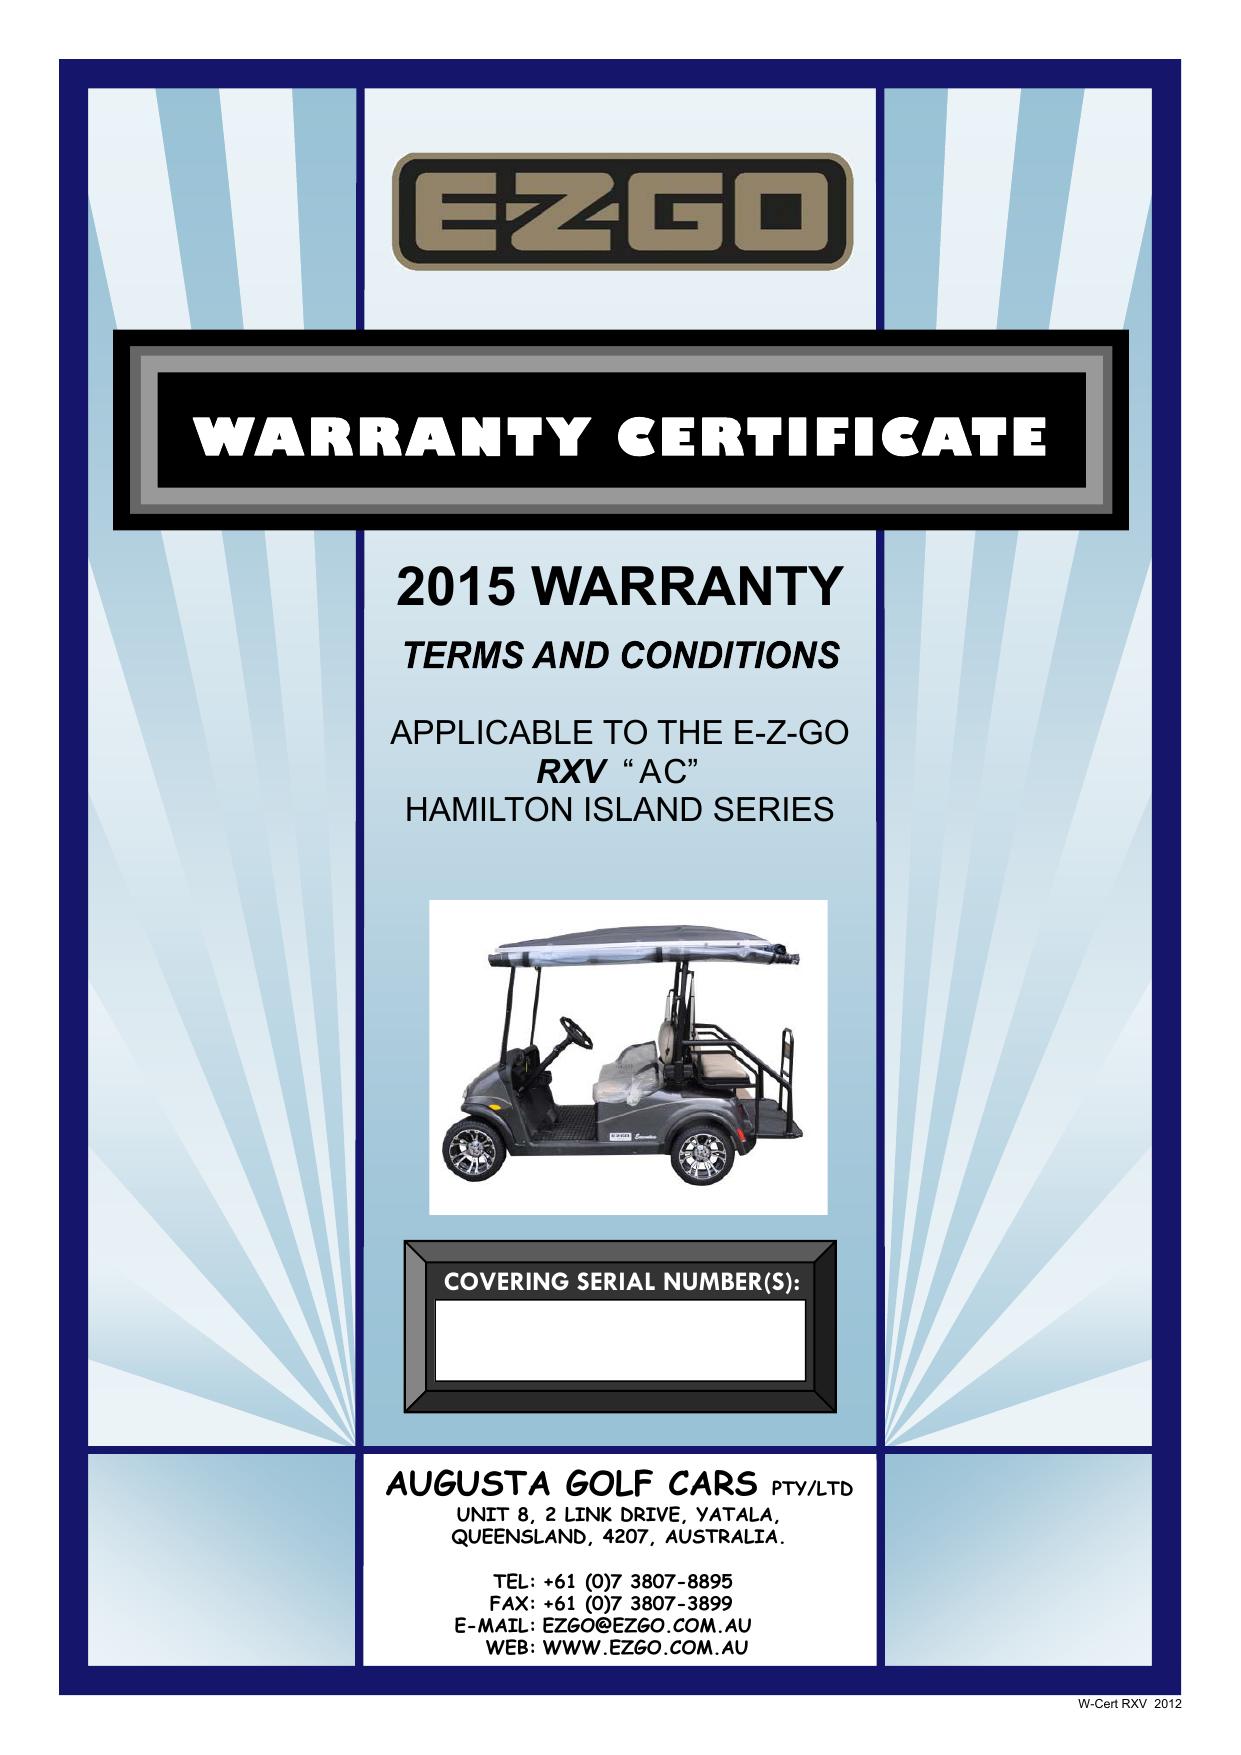 Warranty Certificate - RXV HI - 2015.pub | manualzz.com on gas powered golf carts sale, electric golf carts sale, golf cart utility cart, custom golf carts sale, golf cart trailers, golf cart brands, golf cart repair, golf cart accessories, yamaha golf carts sale, ez go golf carts sale, golf cart seat belts,